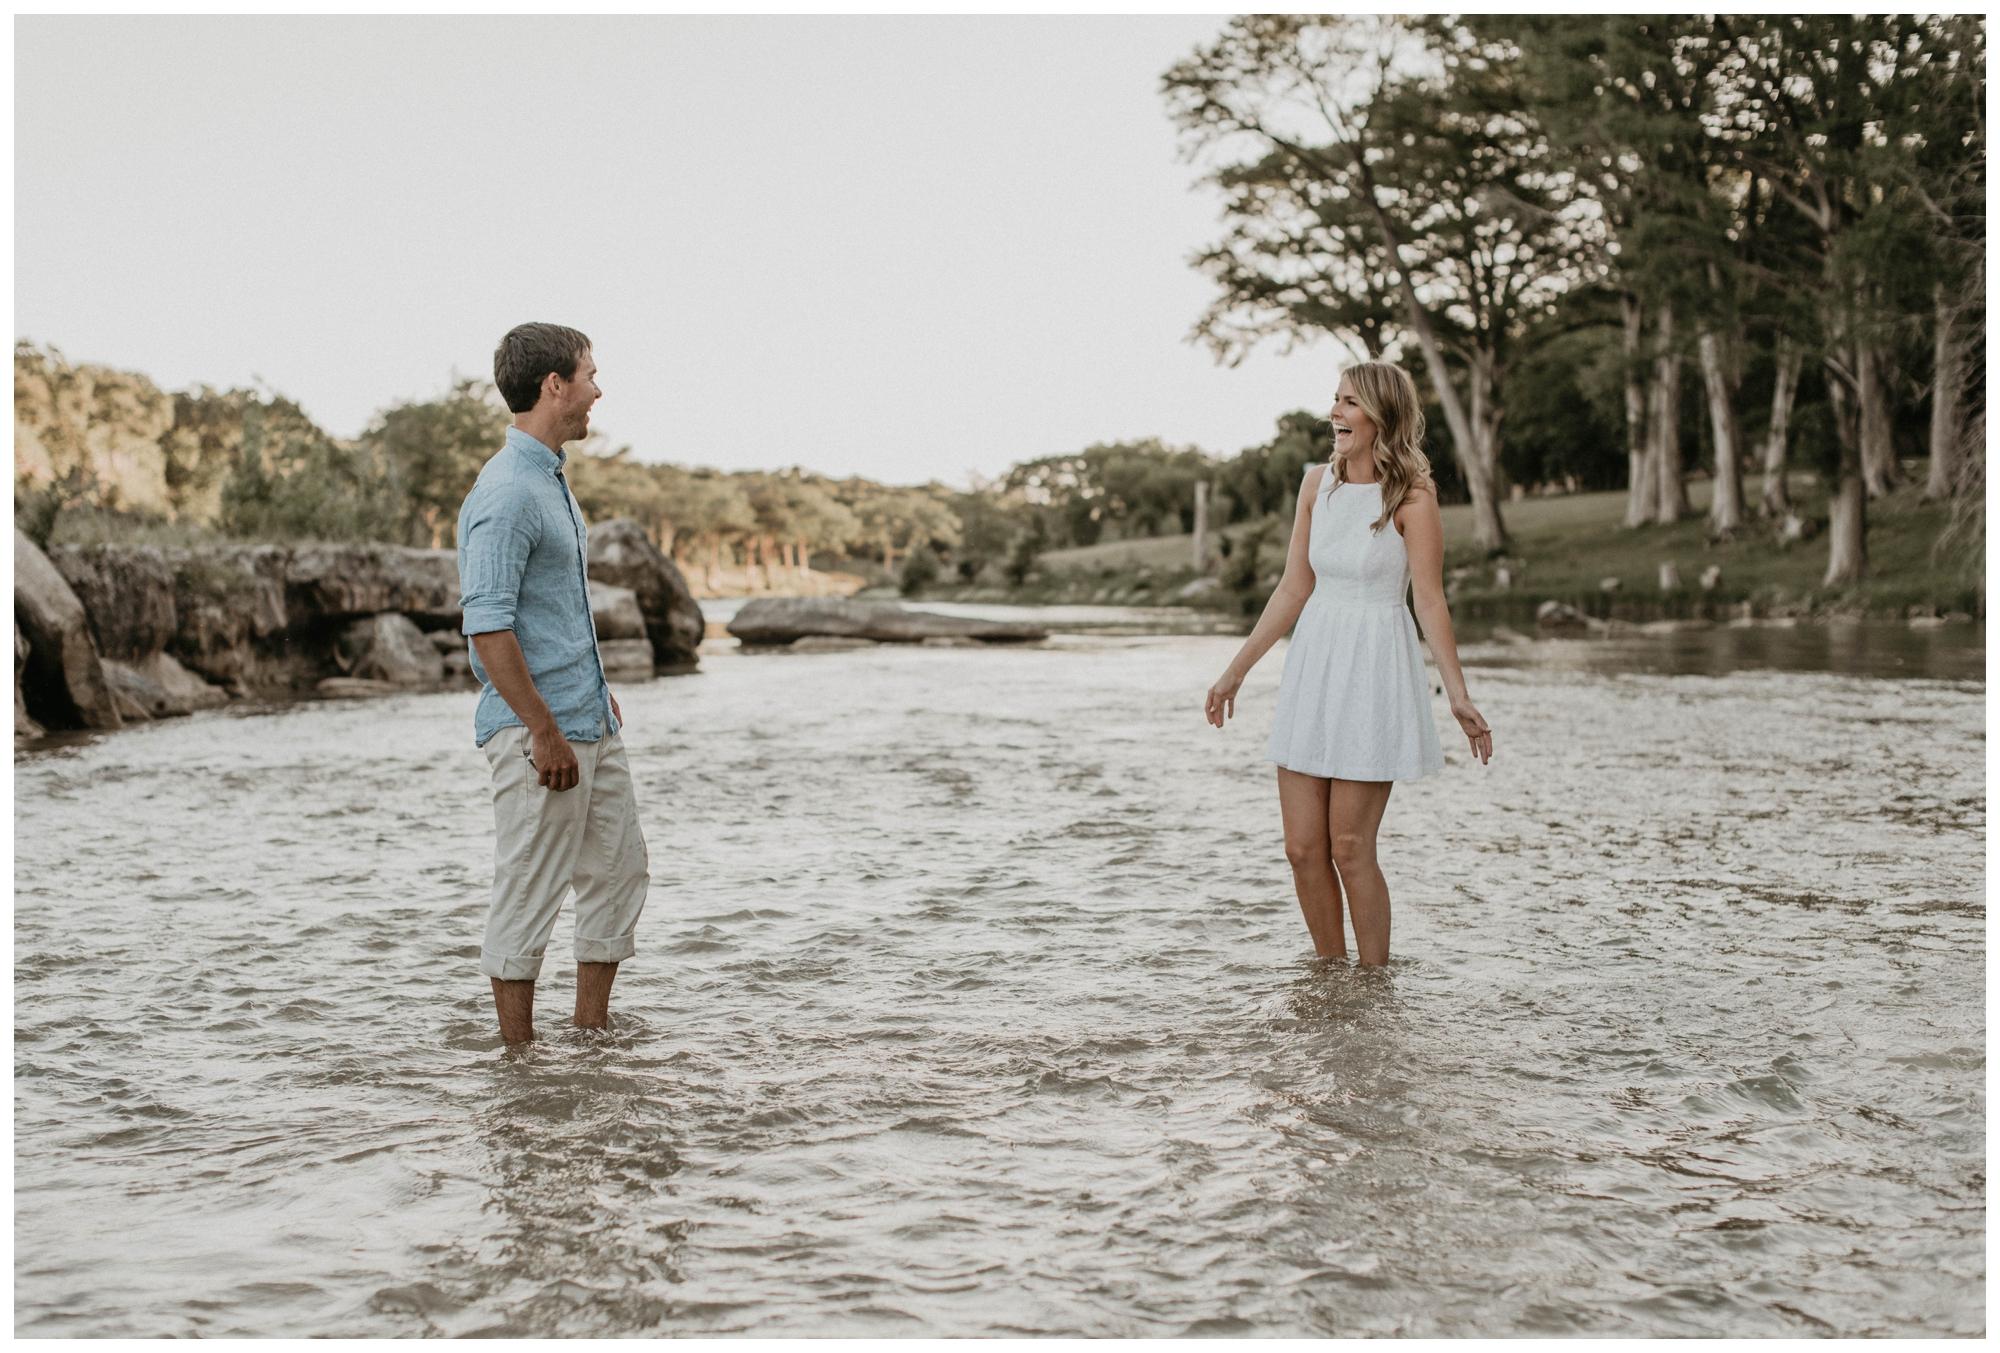 austin-texas-wedding-photography-1778-photographie_0150.jpg